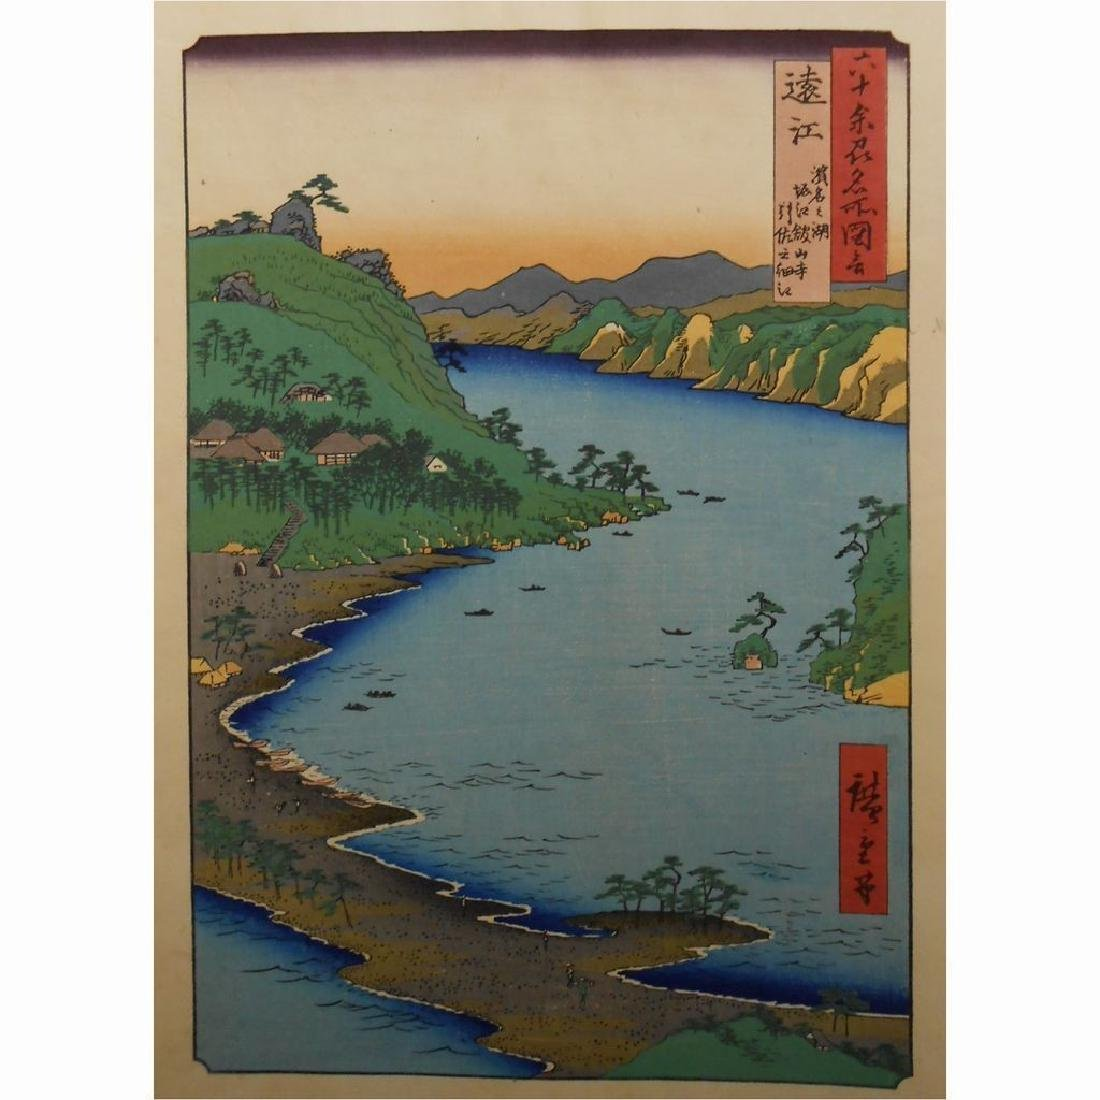 Hiroshige Landscape 20th Century Ukiyo-e Wood Block